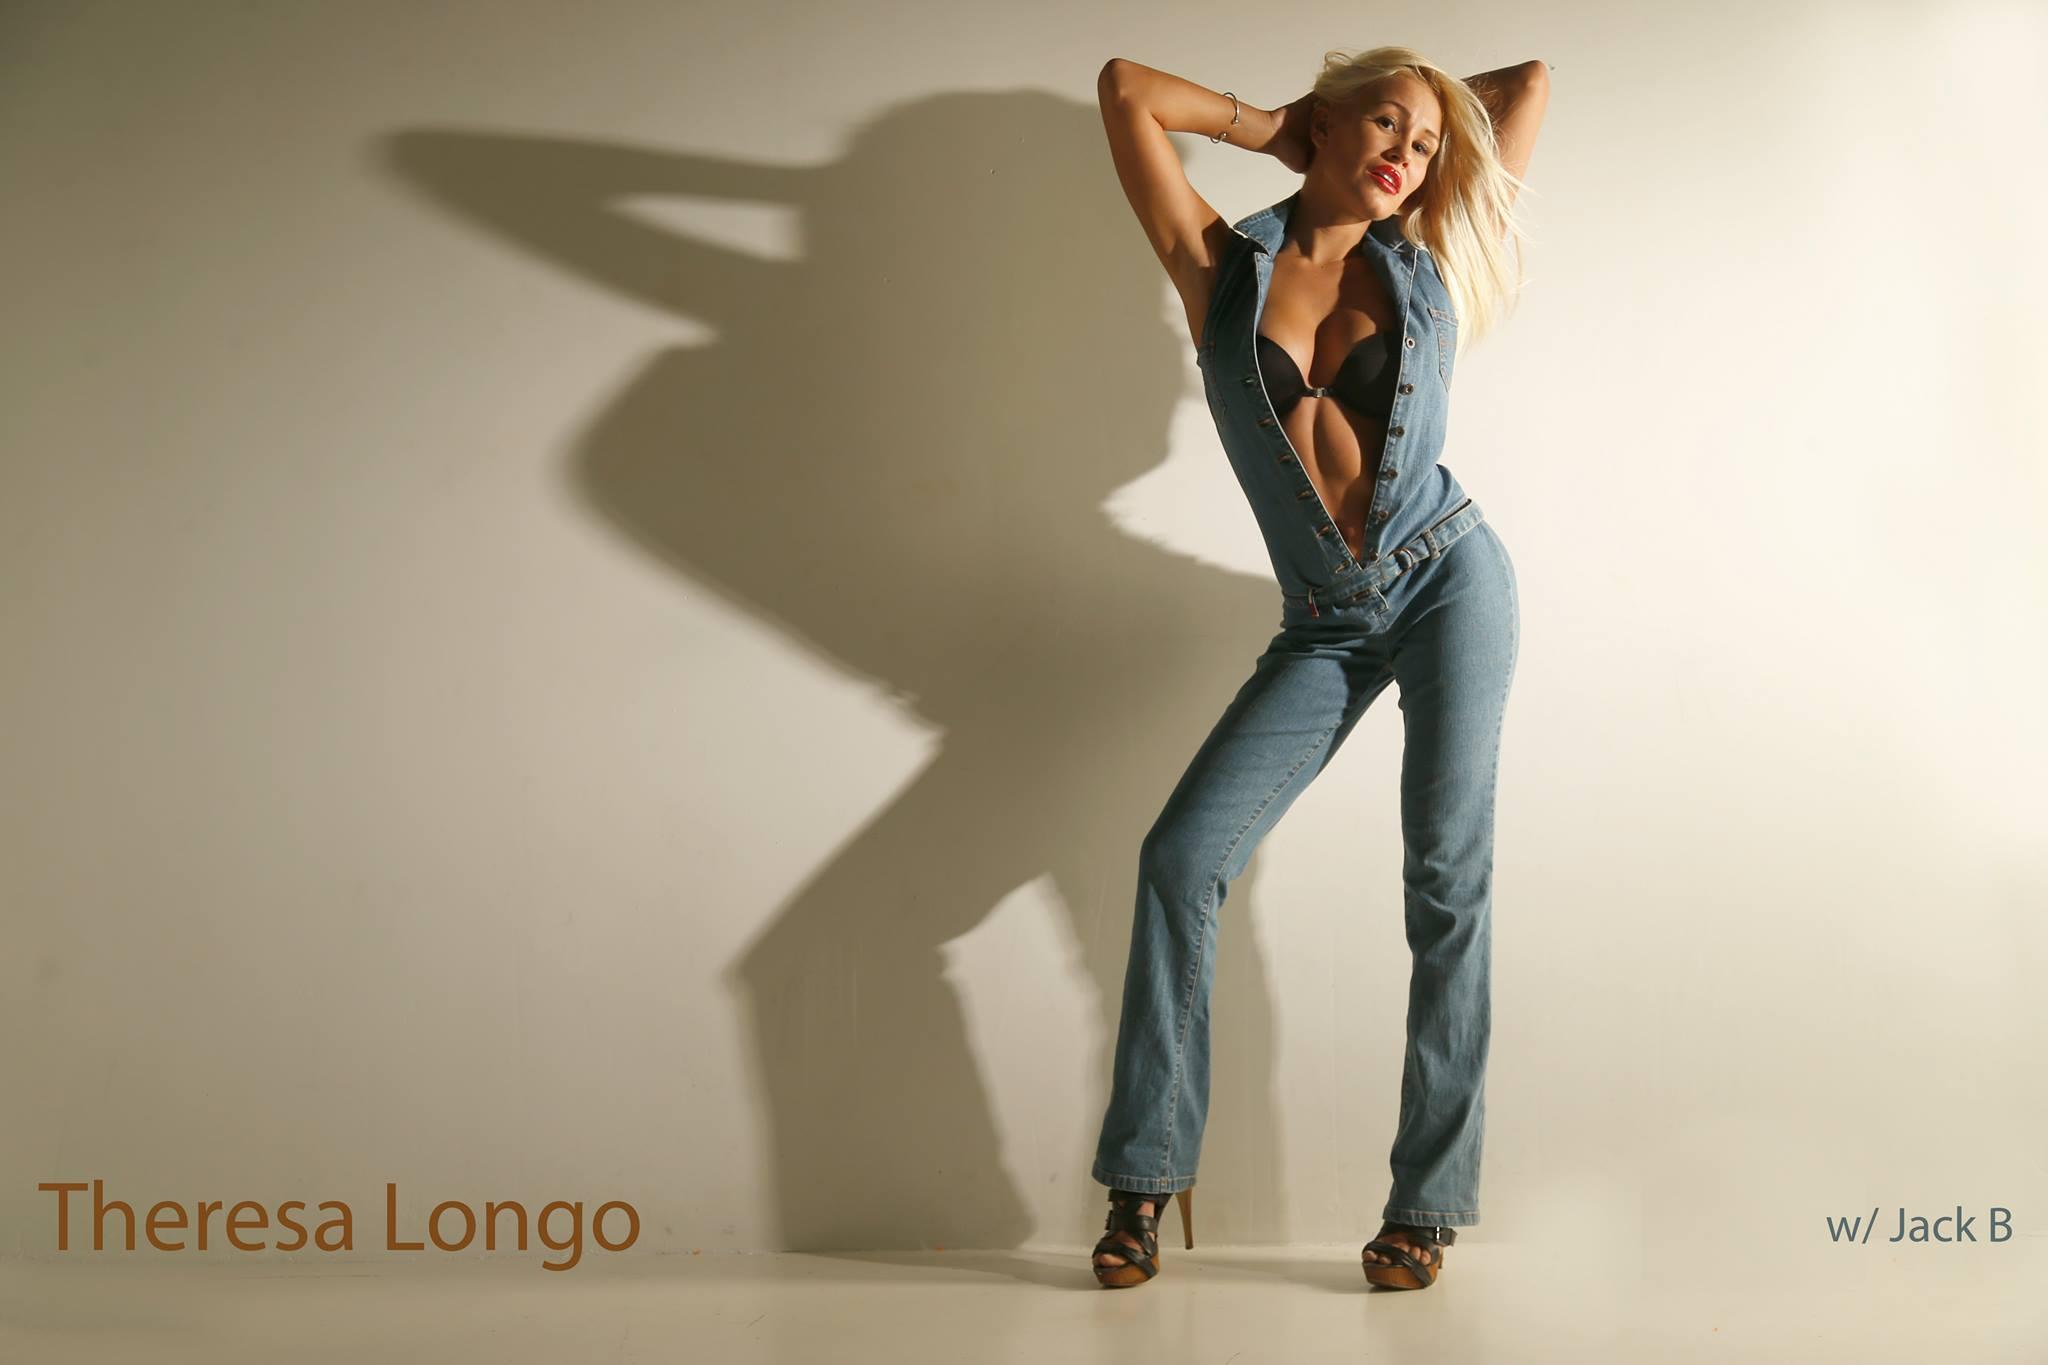 best+supermodels+theresa+longo